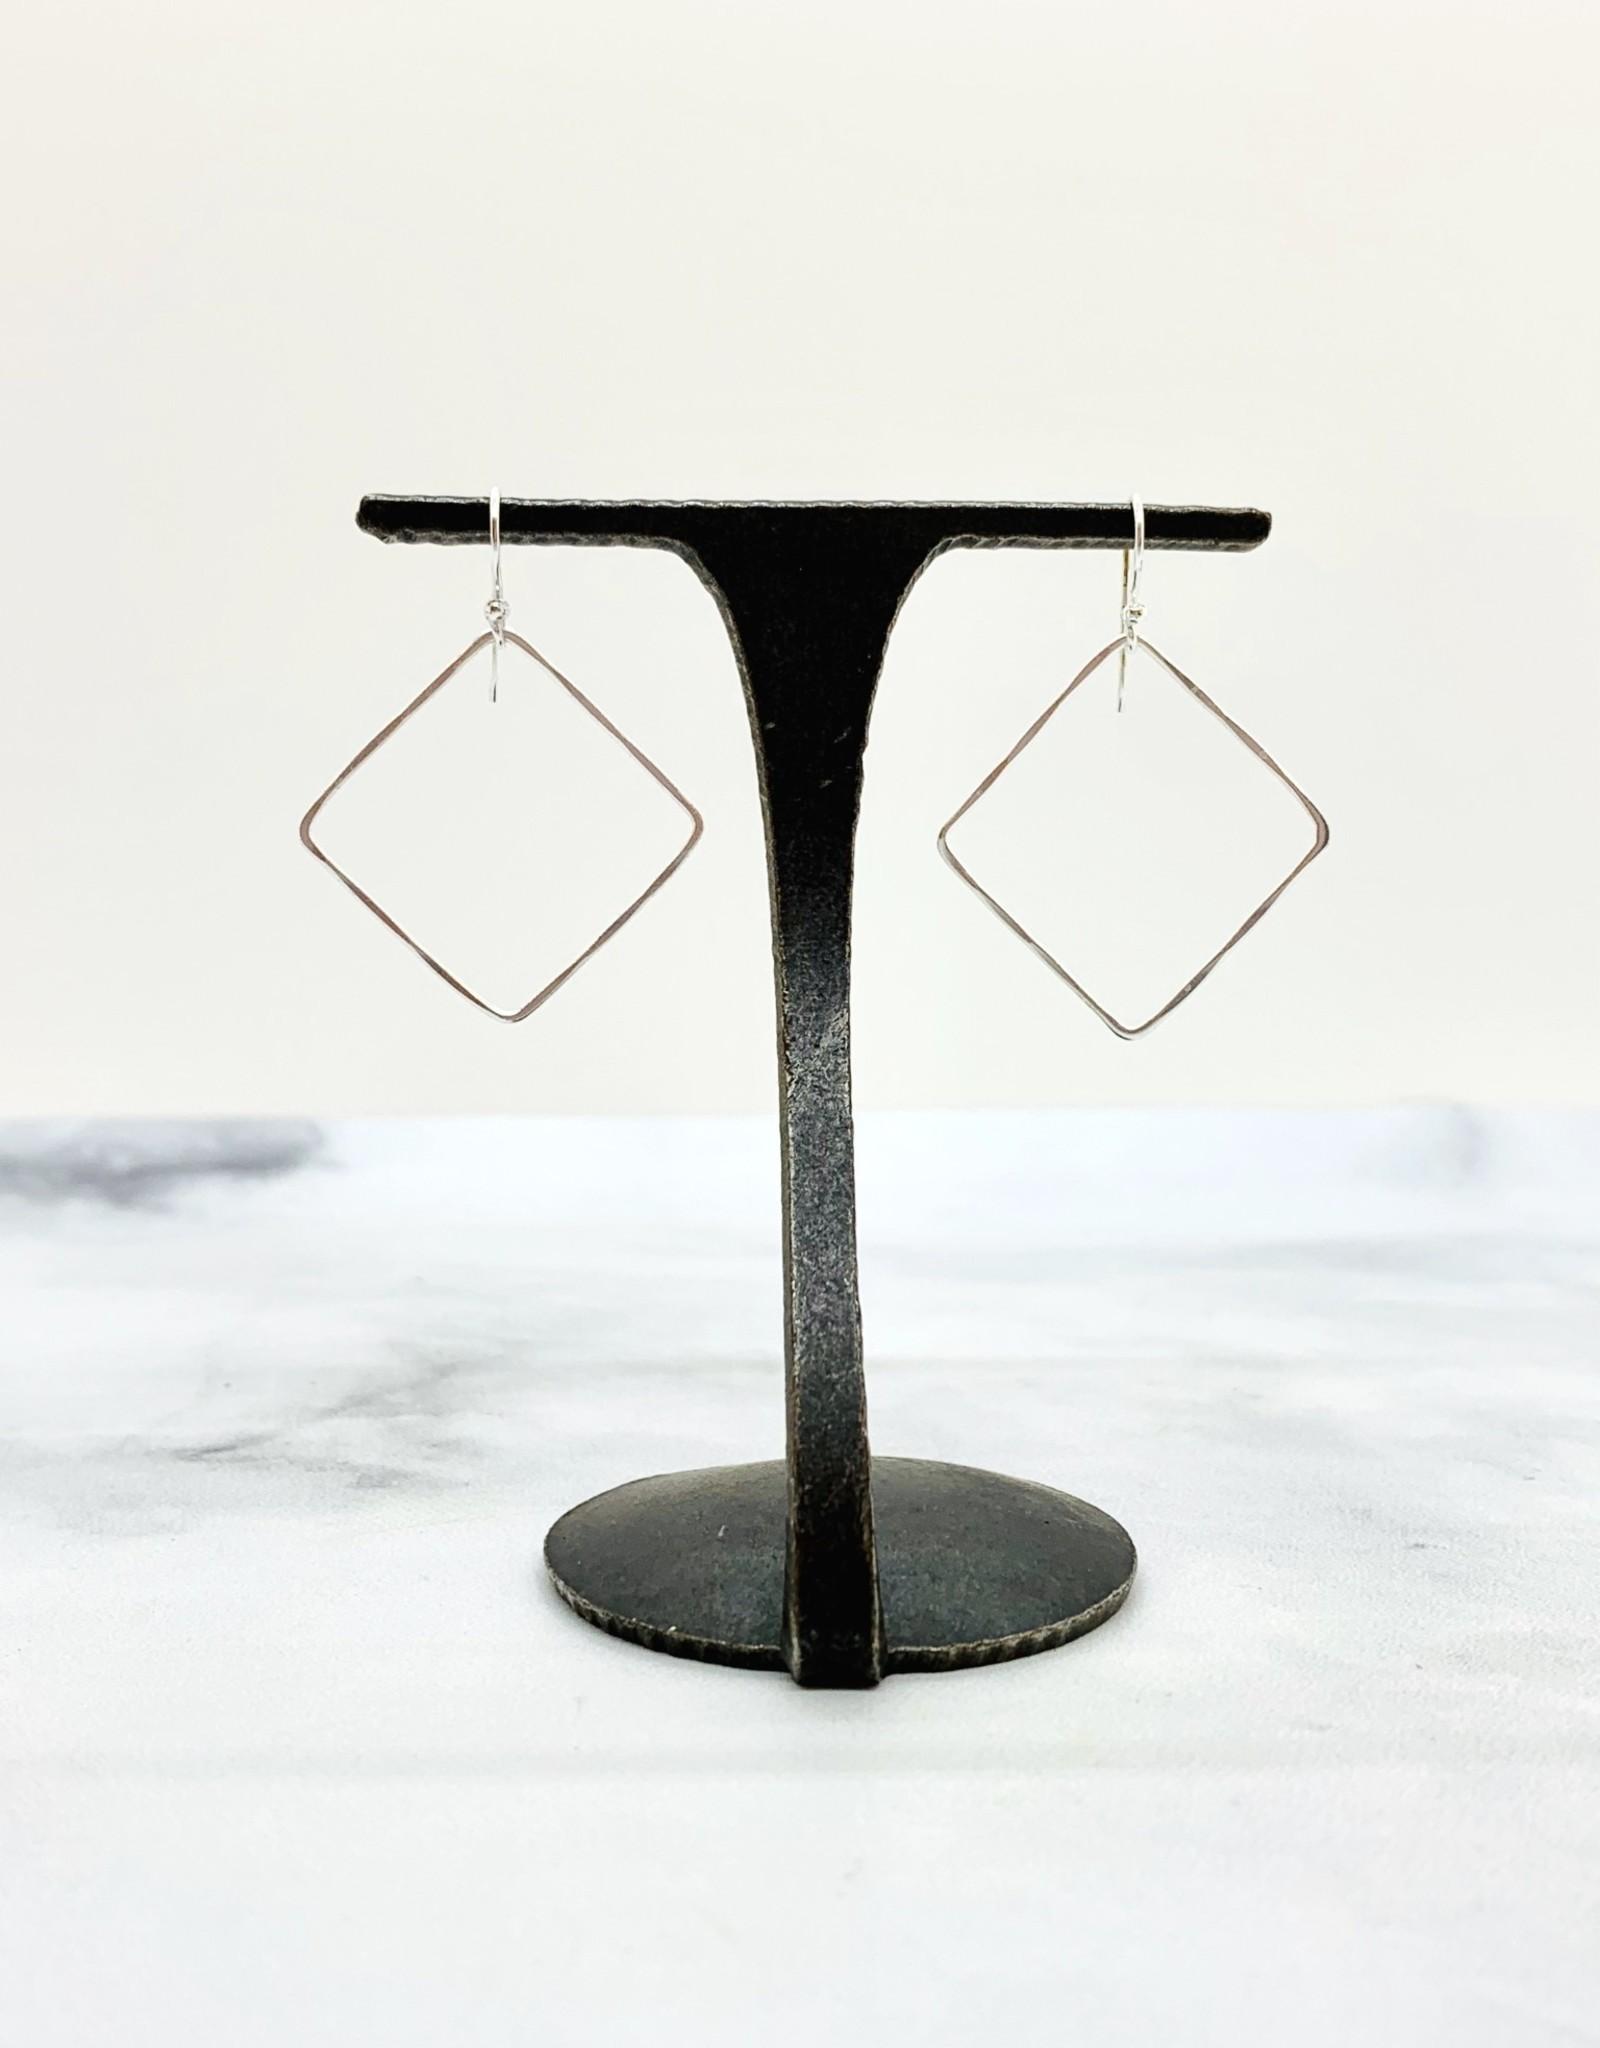 Sterling Silver Square Hook Hoops - 24mm